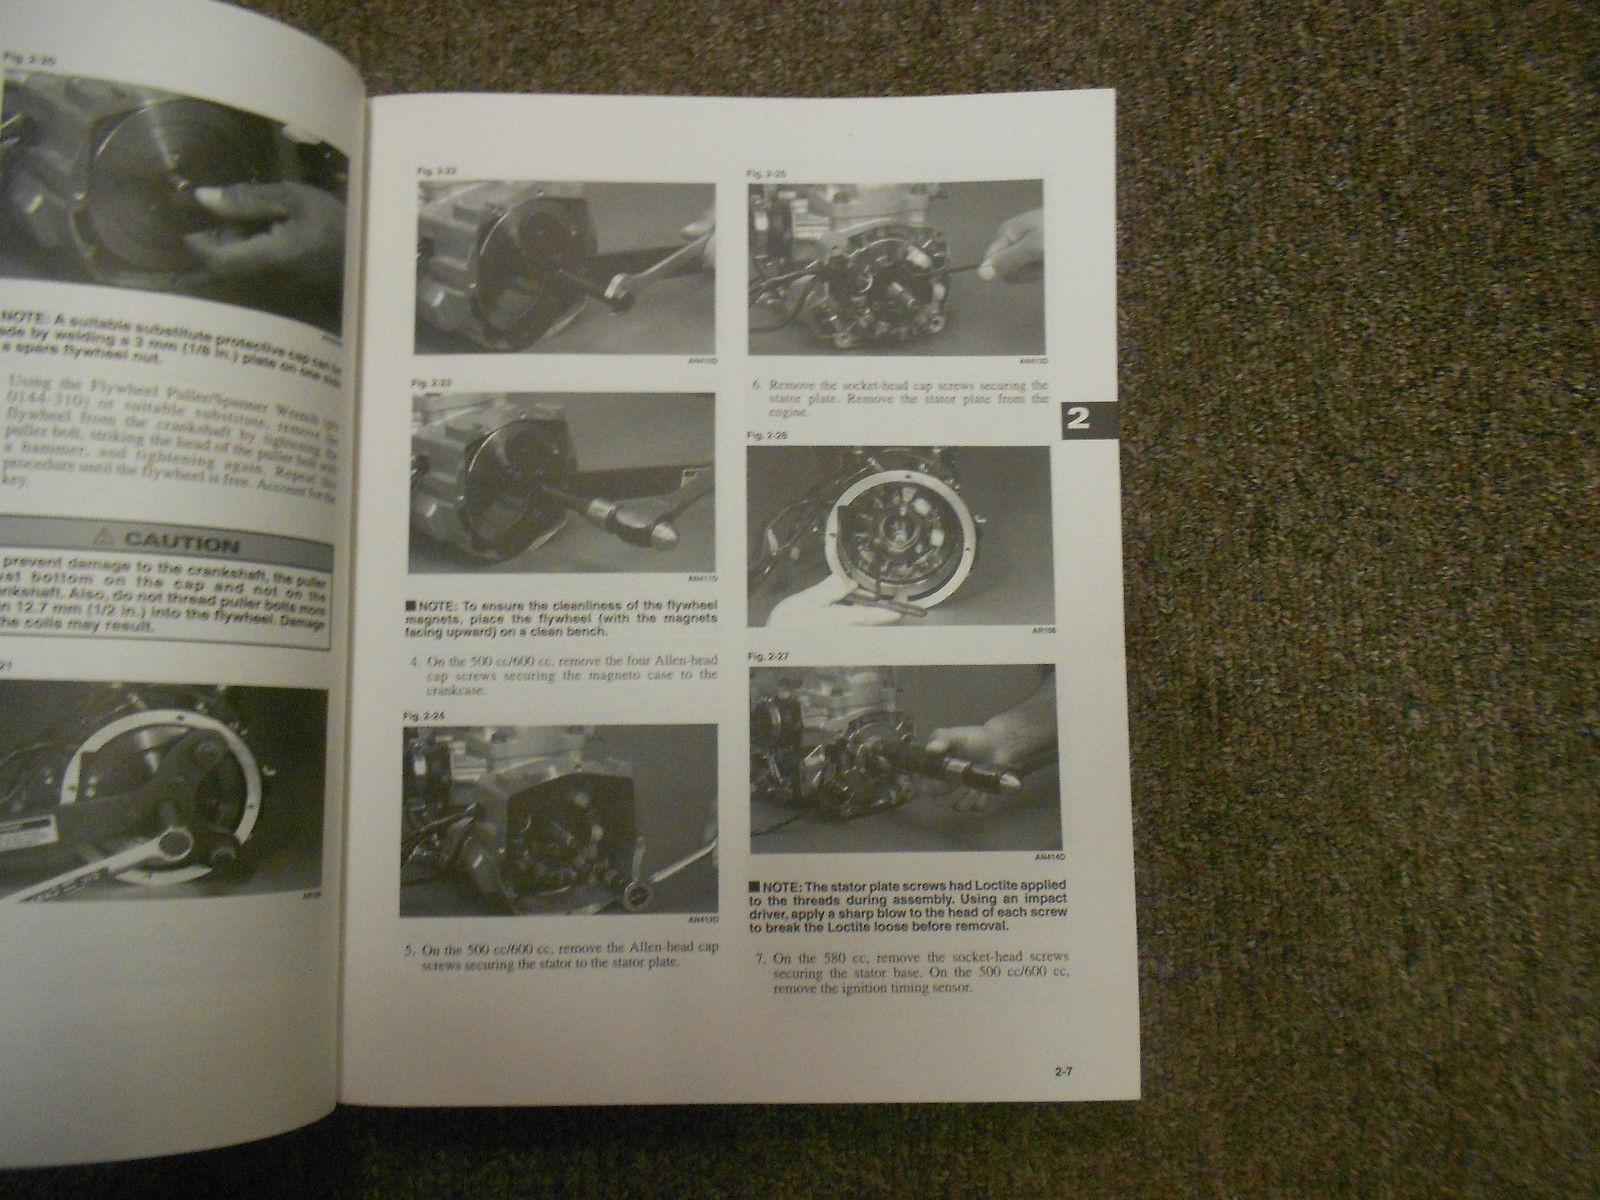 Arctic Cat Cougar 500 Manual